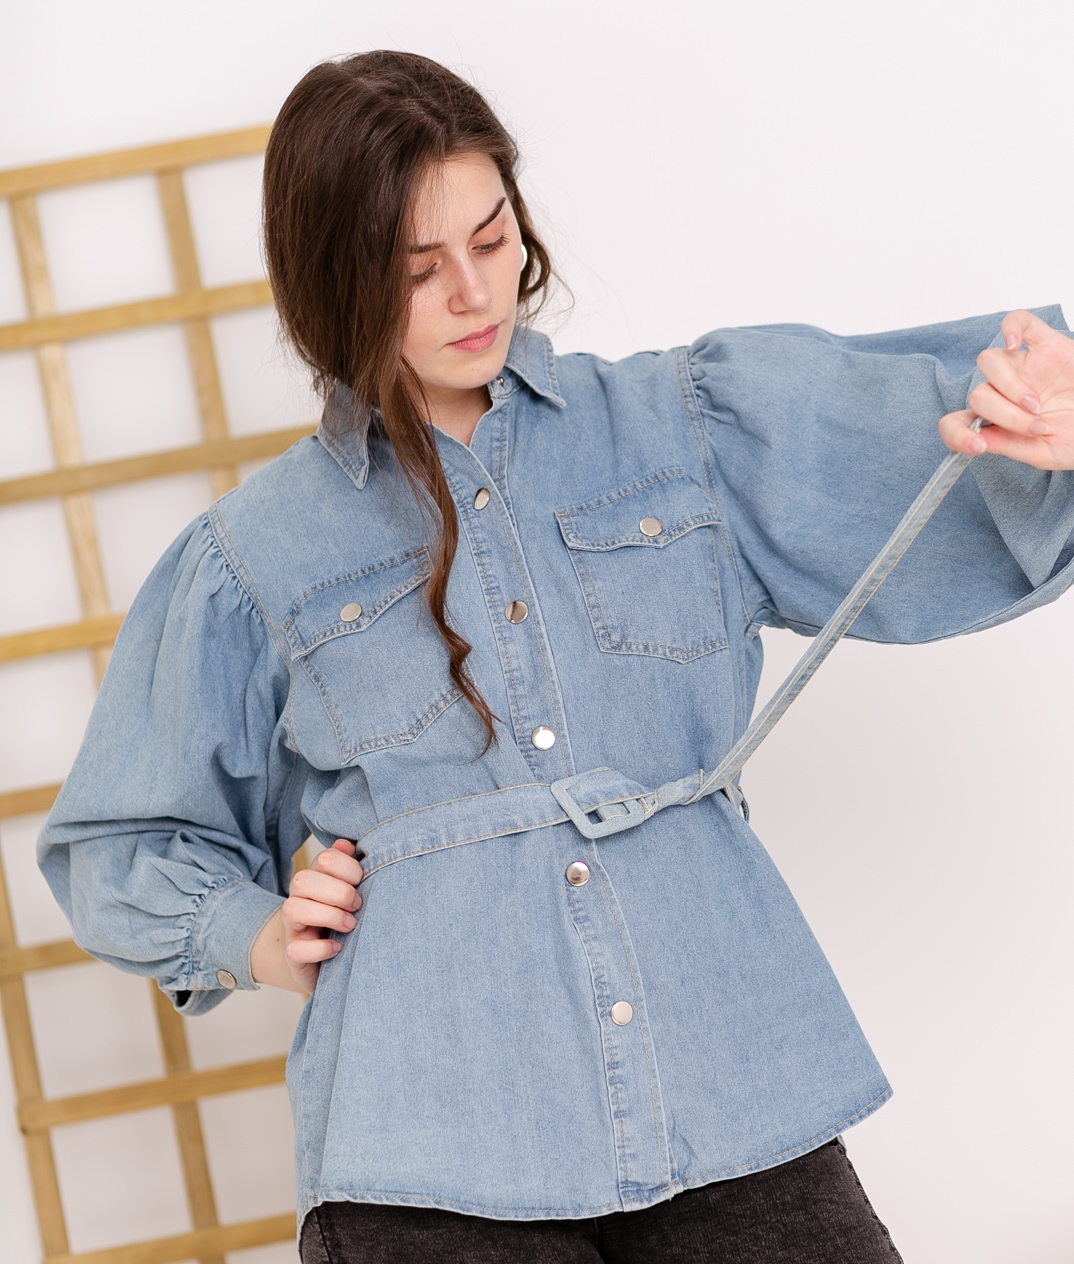 Camisa Masterson - Denim